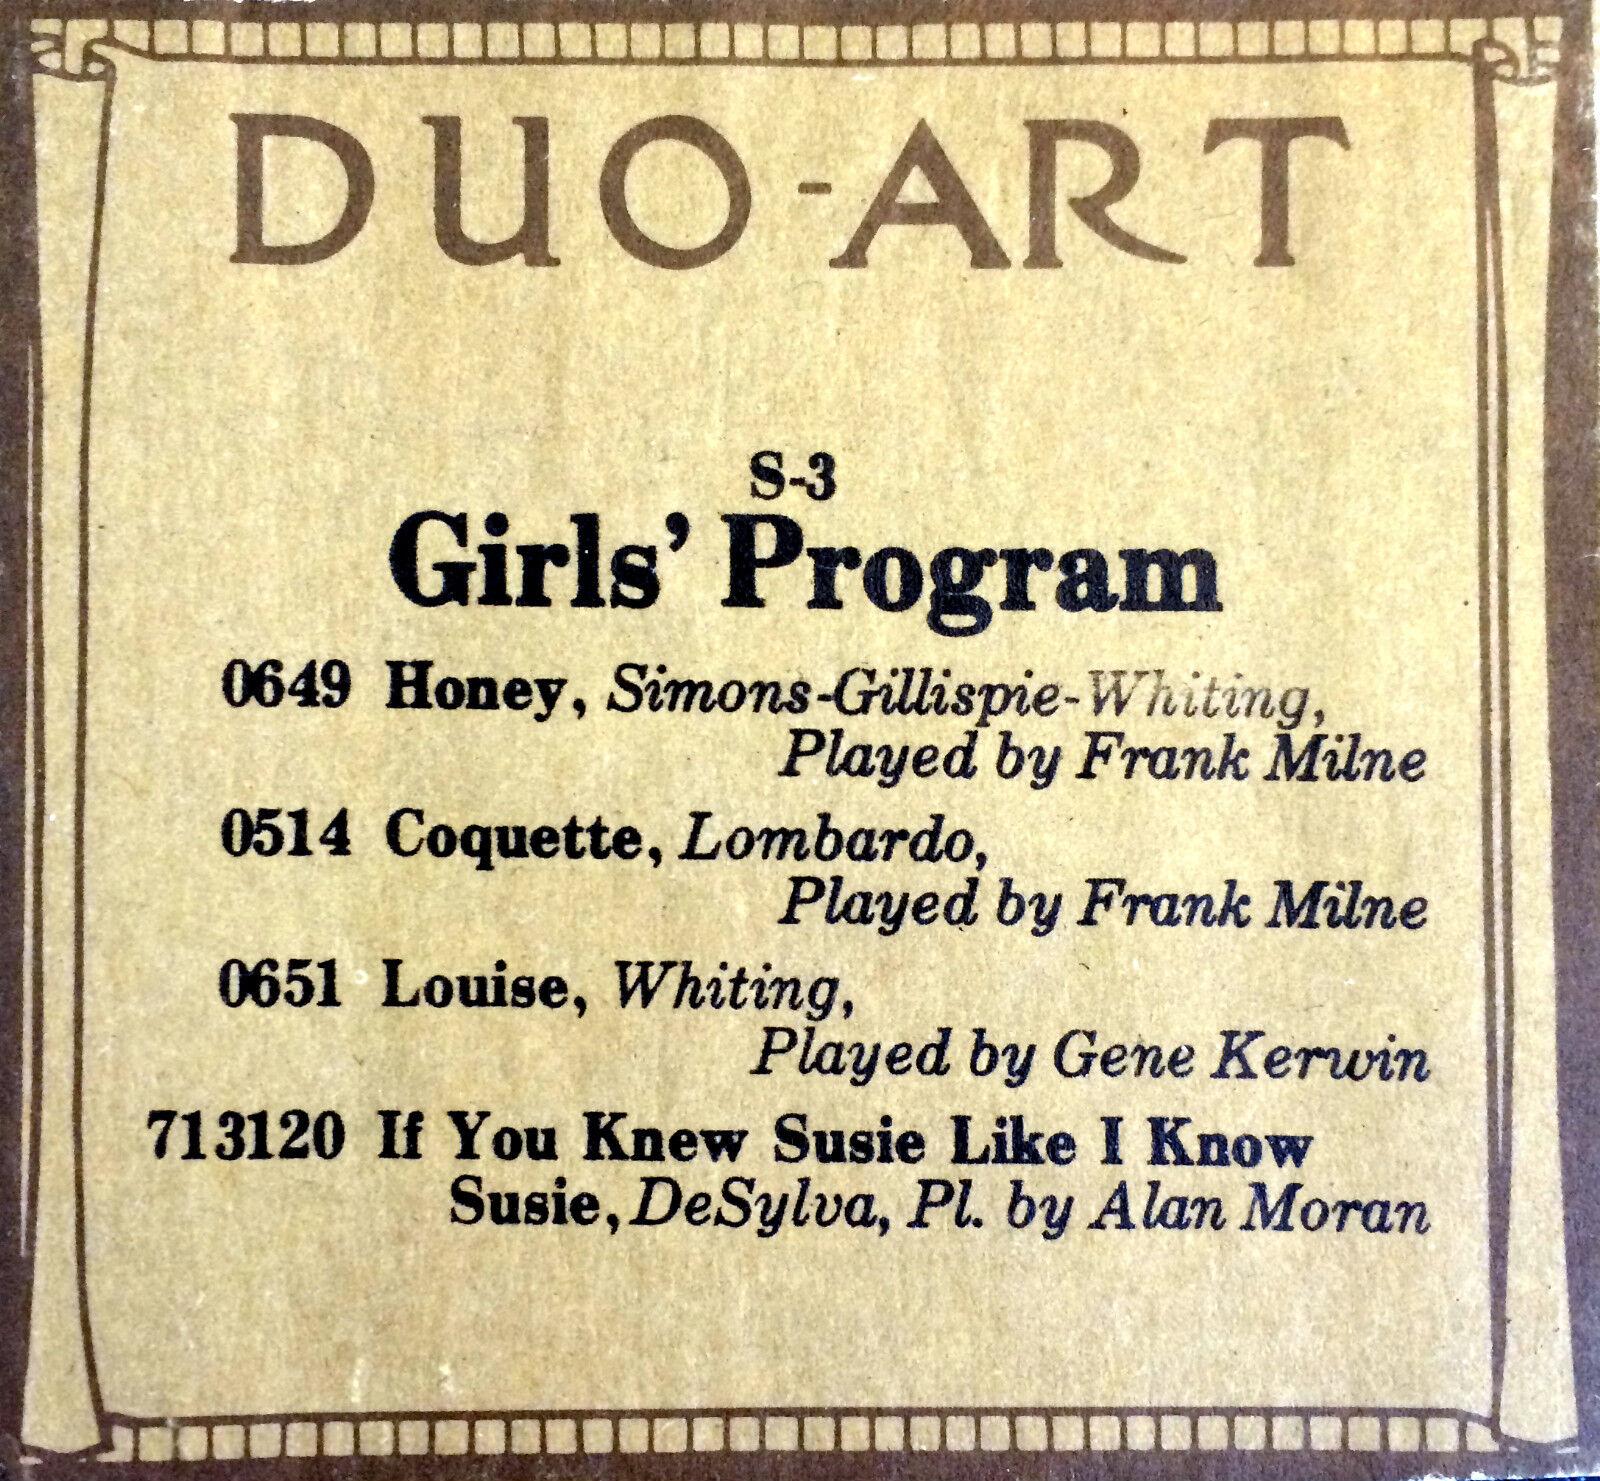 DUO-ART (ReCut) flickor' PROGRAM Milne, Kerwin, Moran S3 Program Player Piano Roll